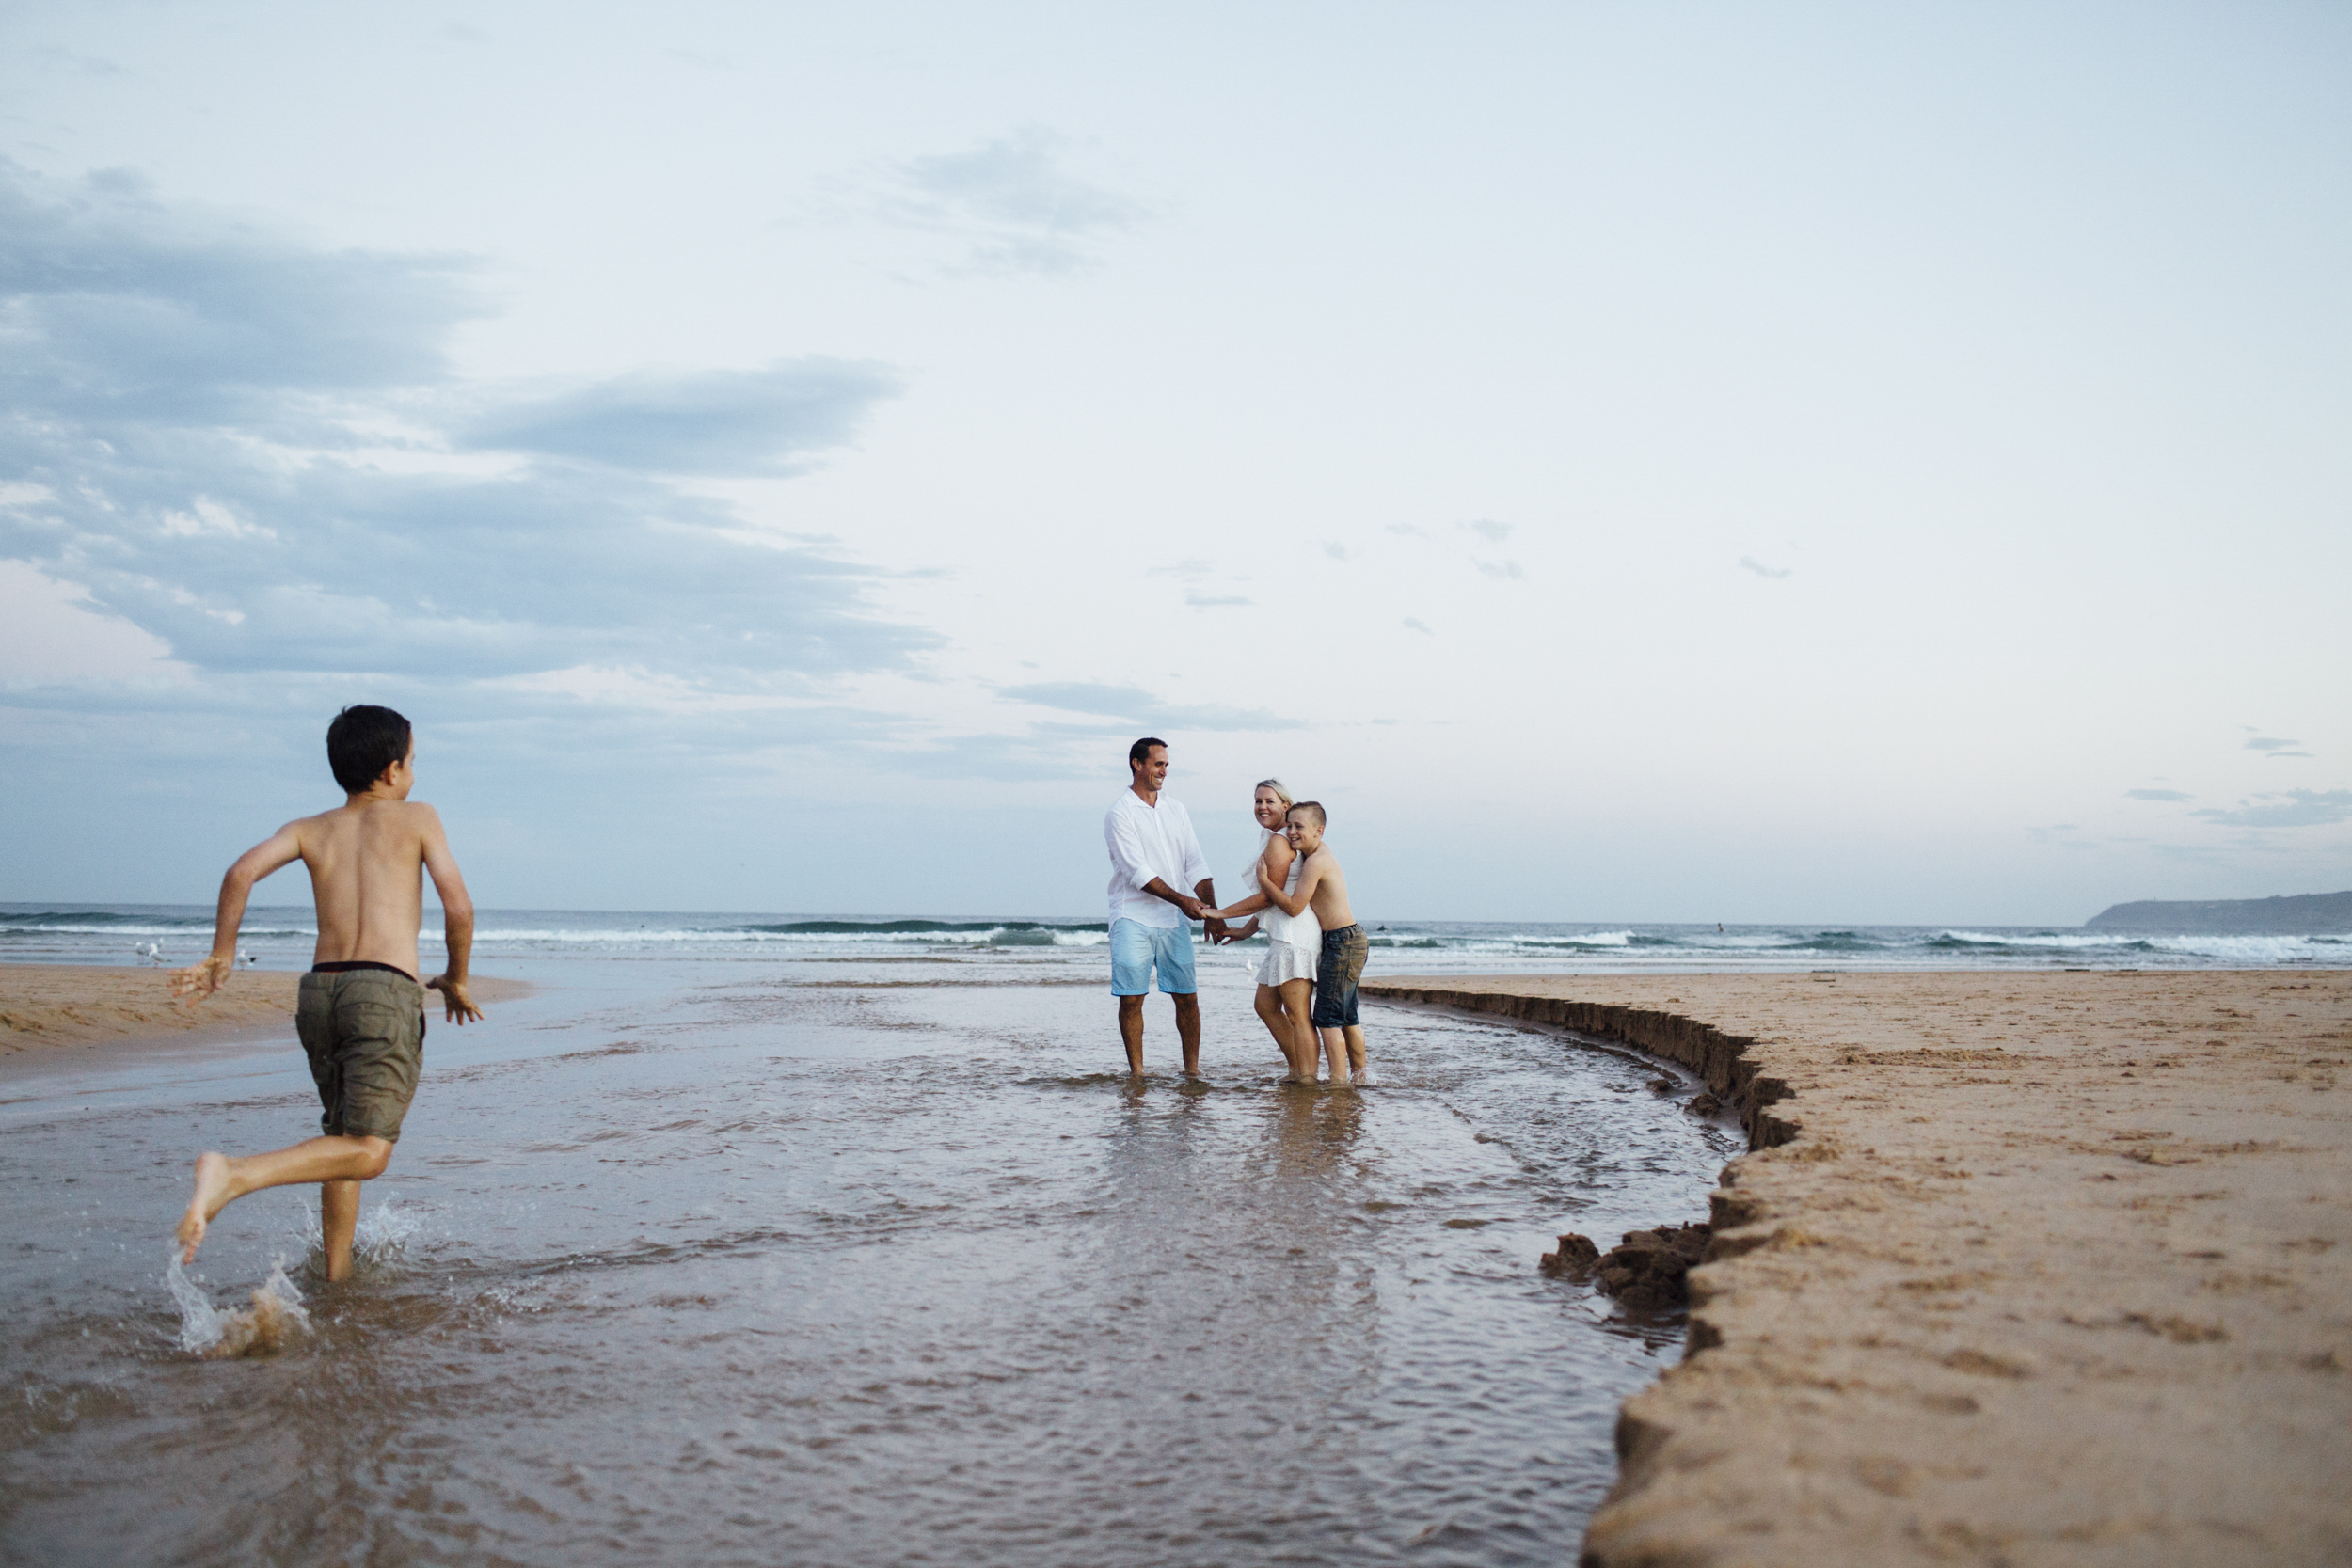 sheridan_nilsson_family_photographer_northern_beaches_eastern_suburbs_sydney-483.JPG